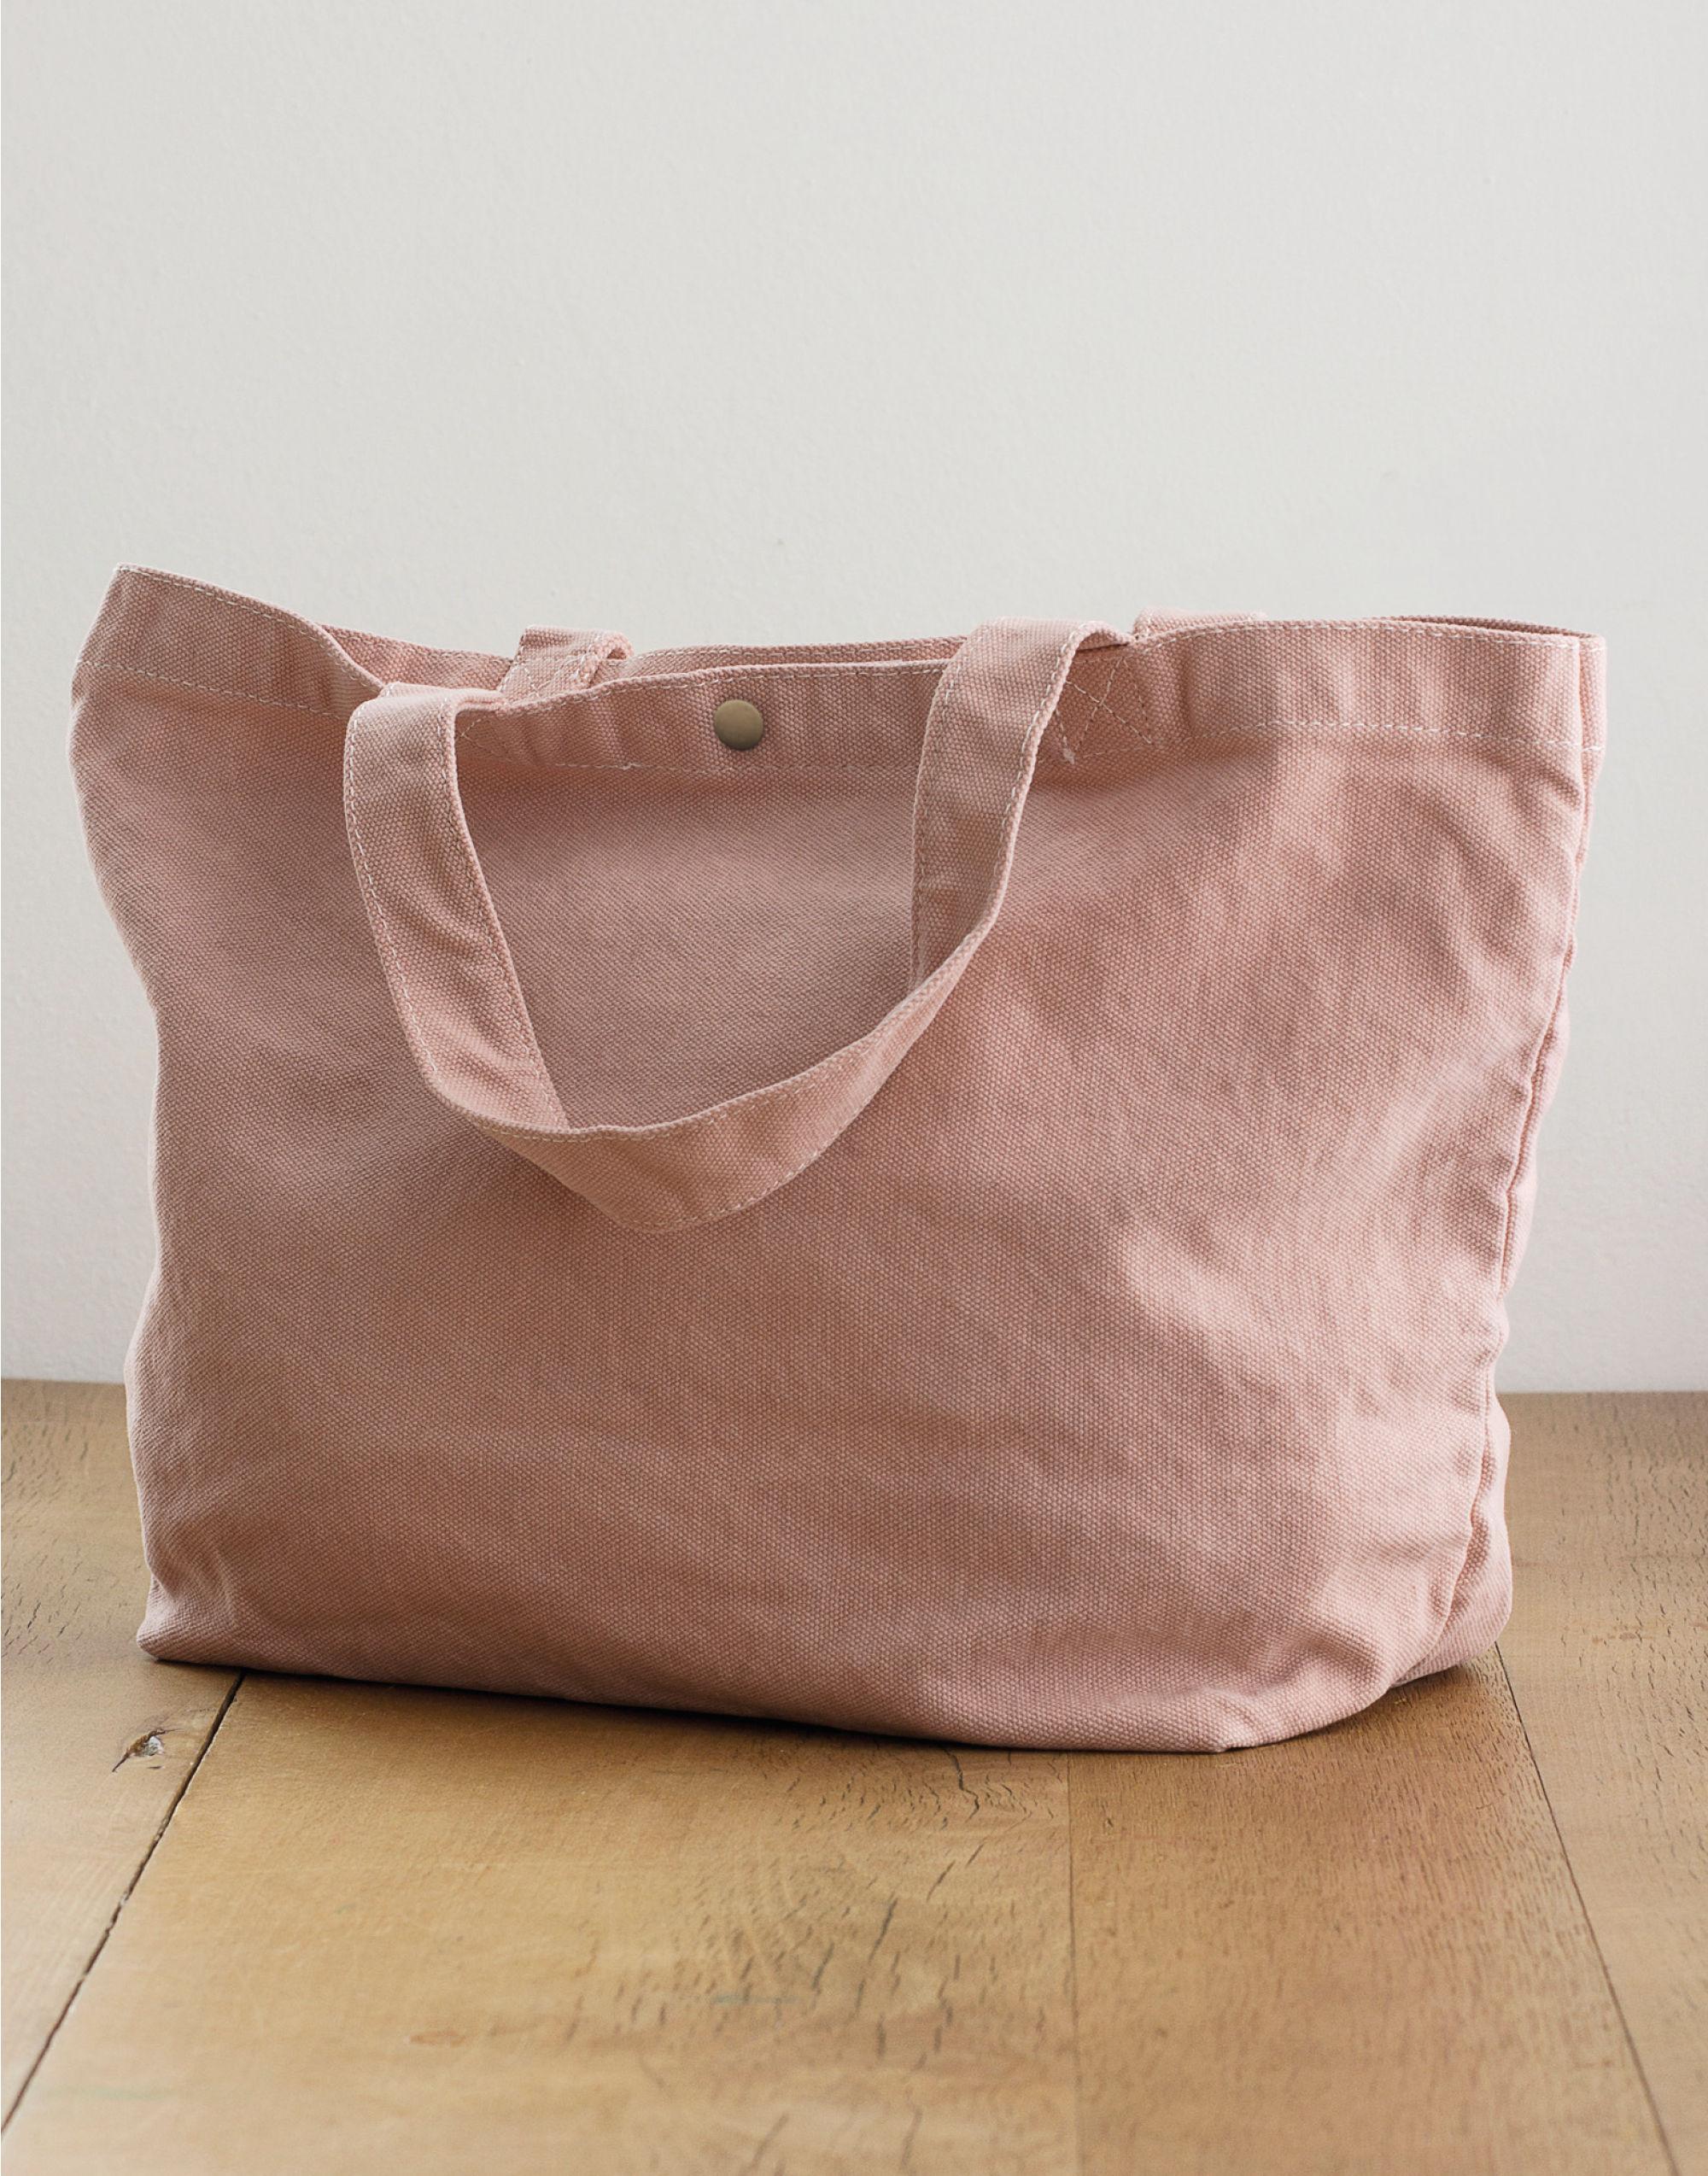 Bags By Jassz Small Canvas Shopper